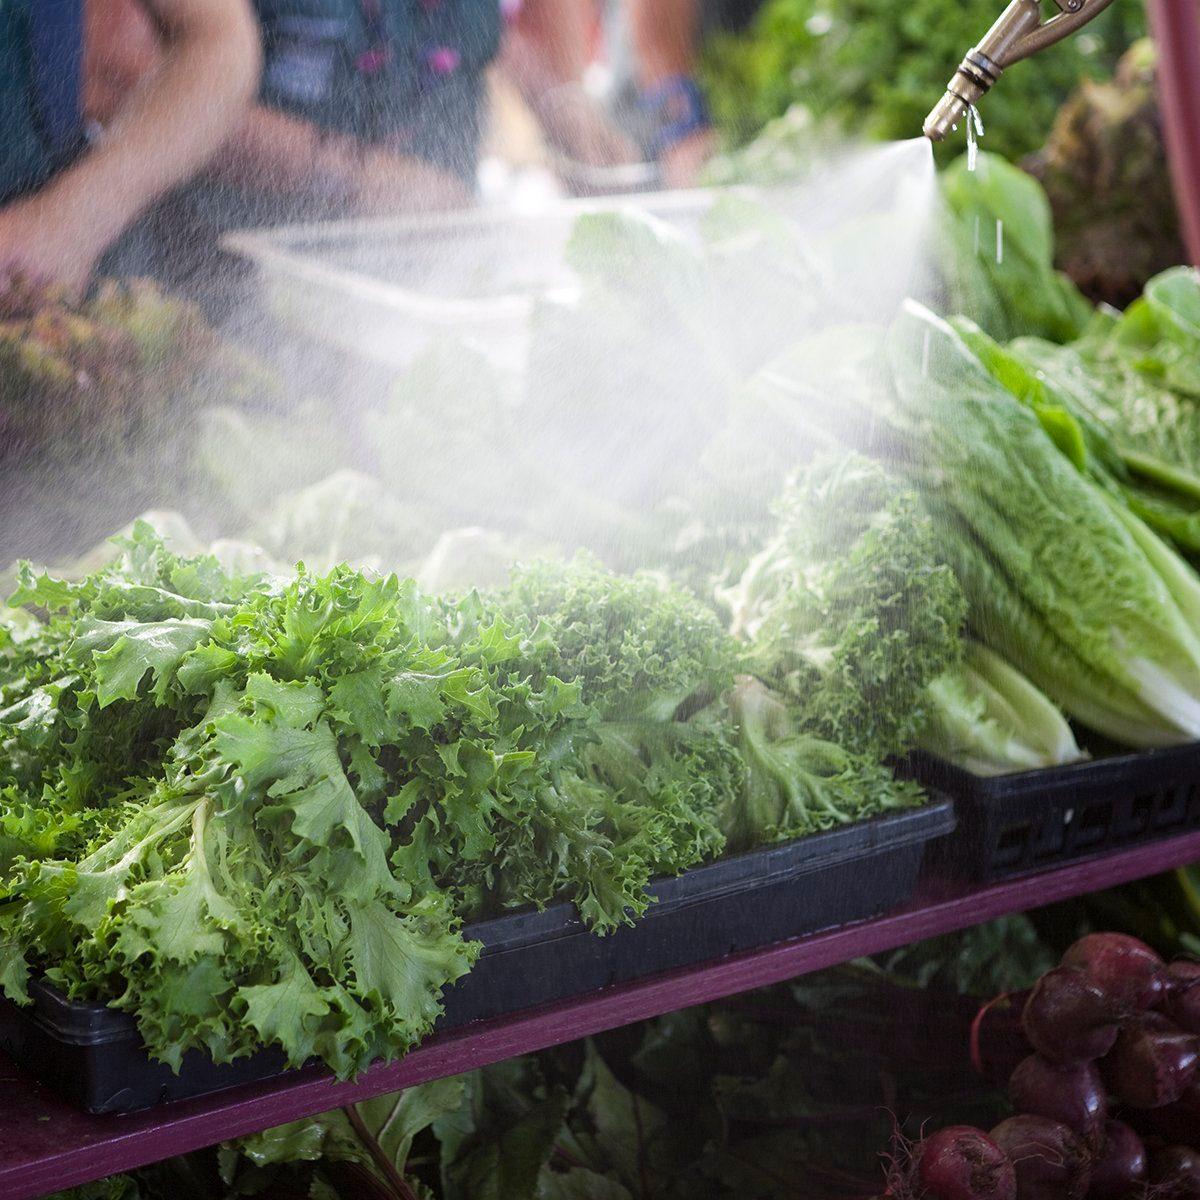 A farmer washes fresh lettuce at a farmers market stall. Abundant fresh produce piled high at a farmers market. Check out my